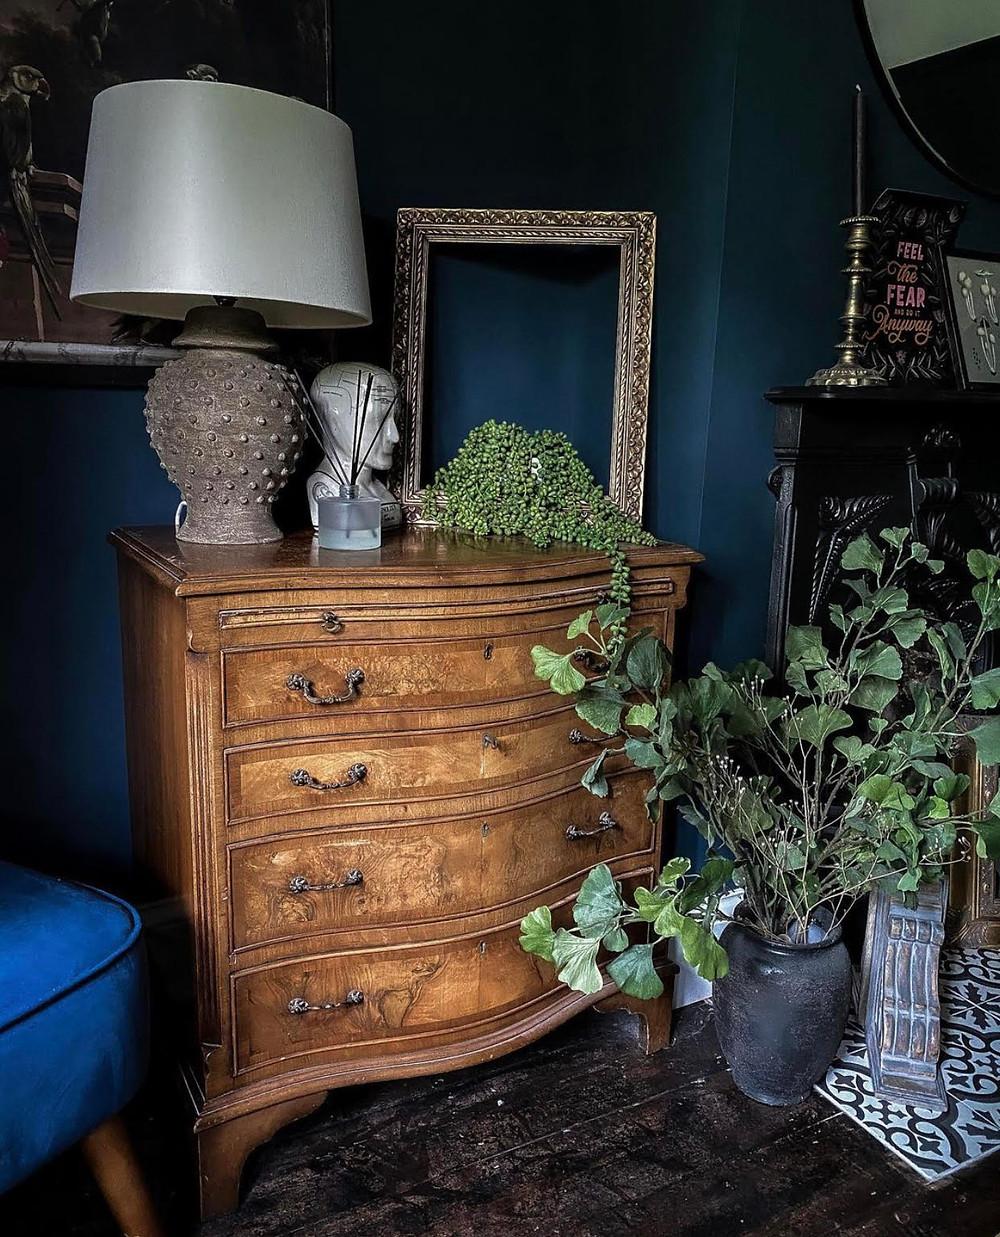 dark blue decor vintage furniture sustainable decor reclaimed preloved